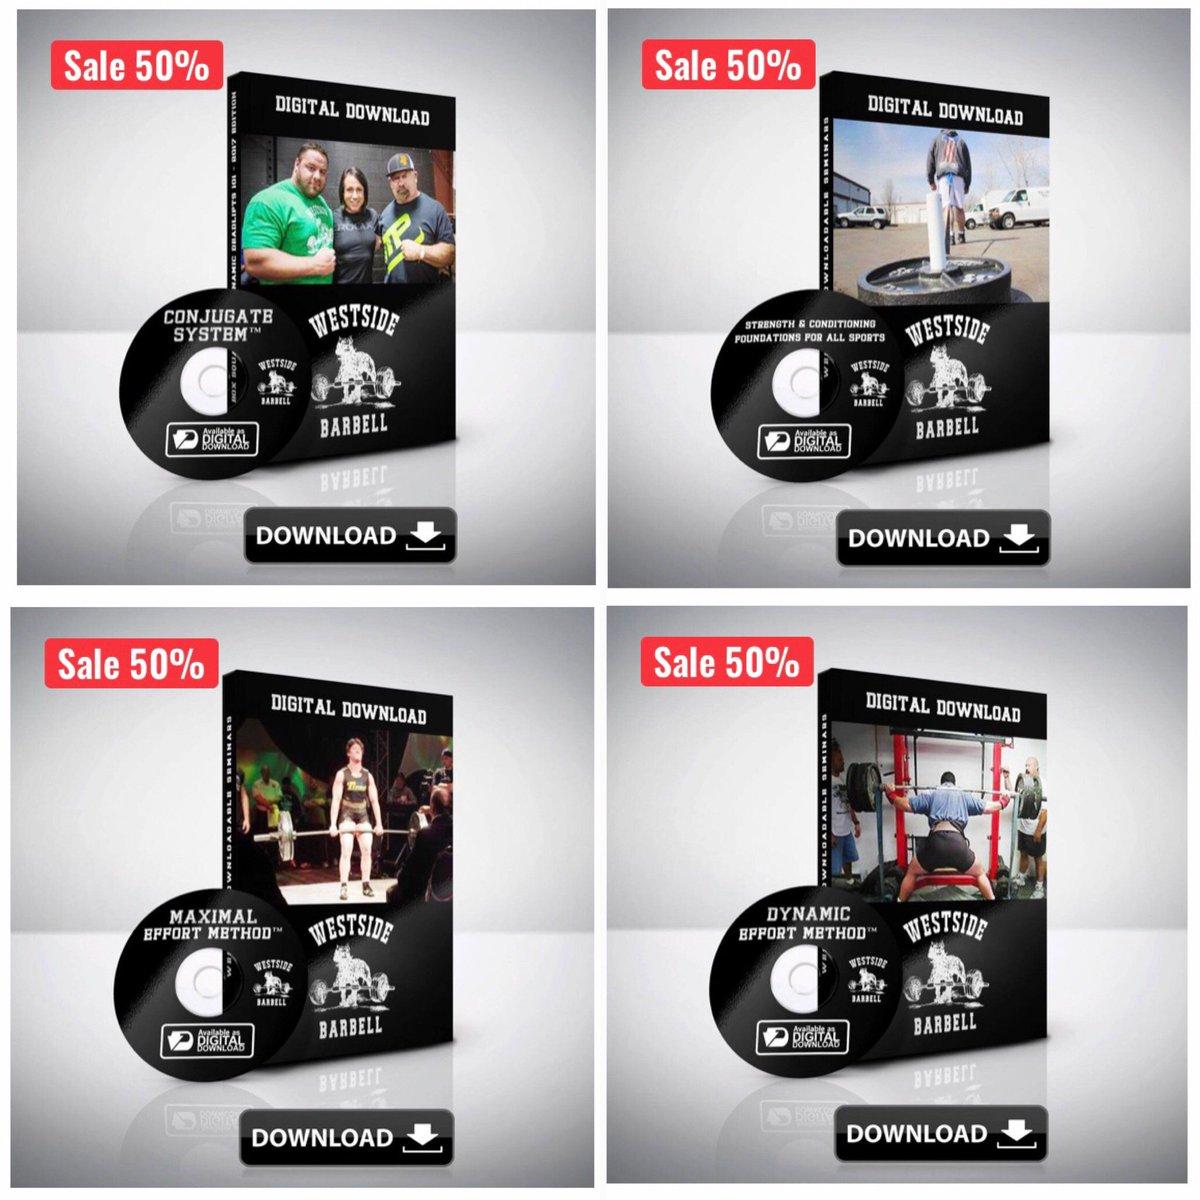 Digital July Sale! Westside Downloadable Seminars up to 50